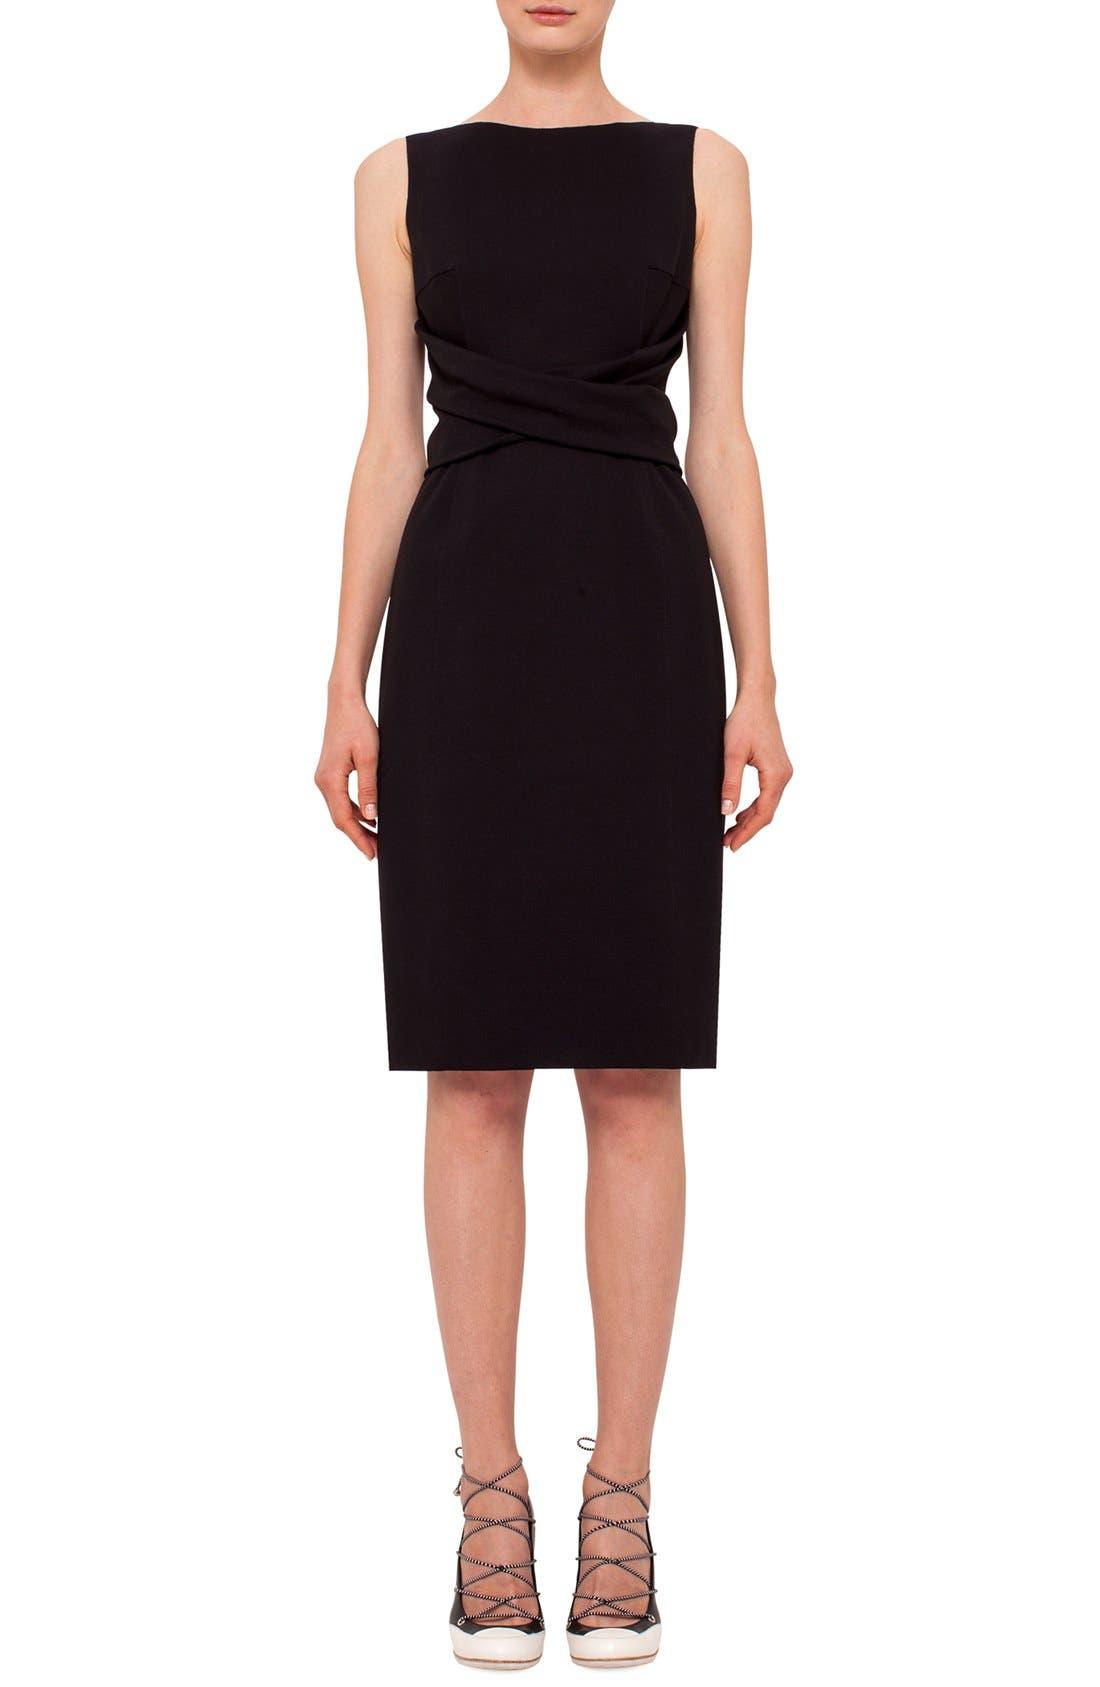 Alternate Image 1 Selected - Akris punto Twist Front Sleeveless Jersey Sheath Dress